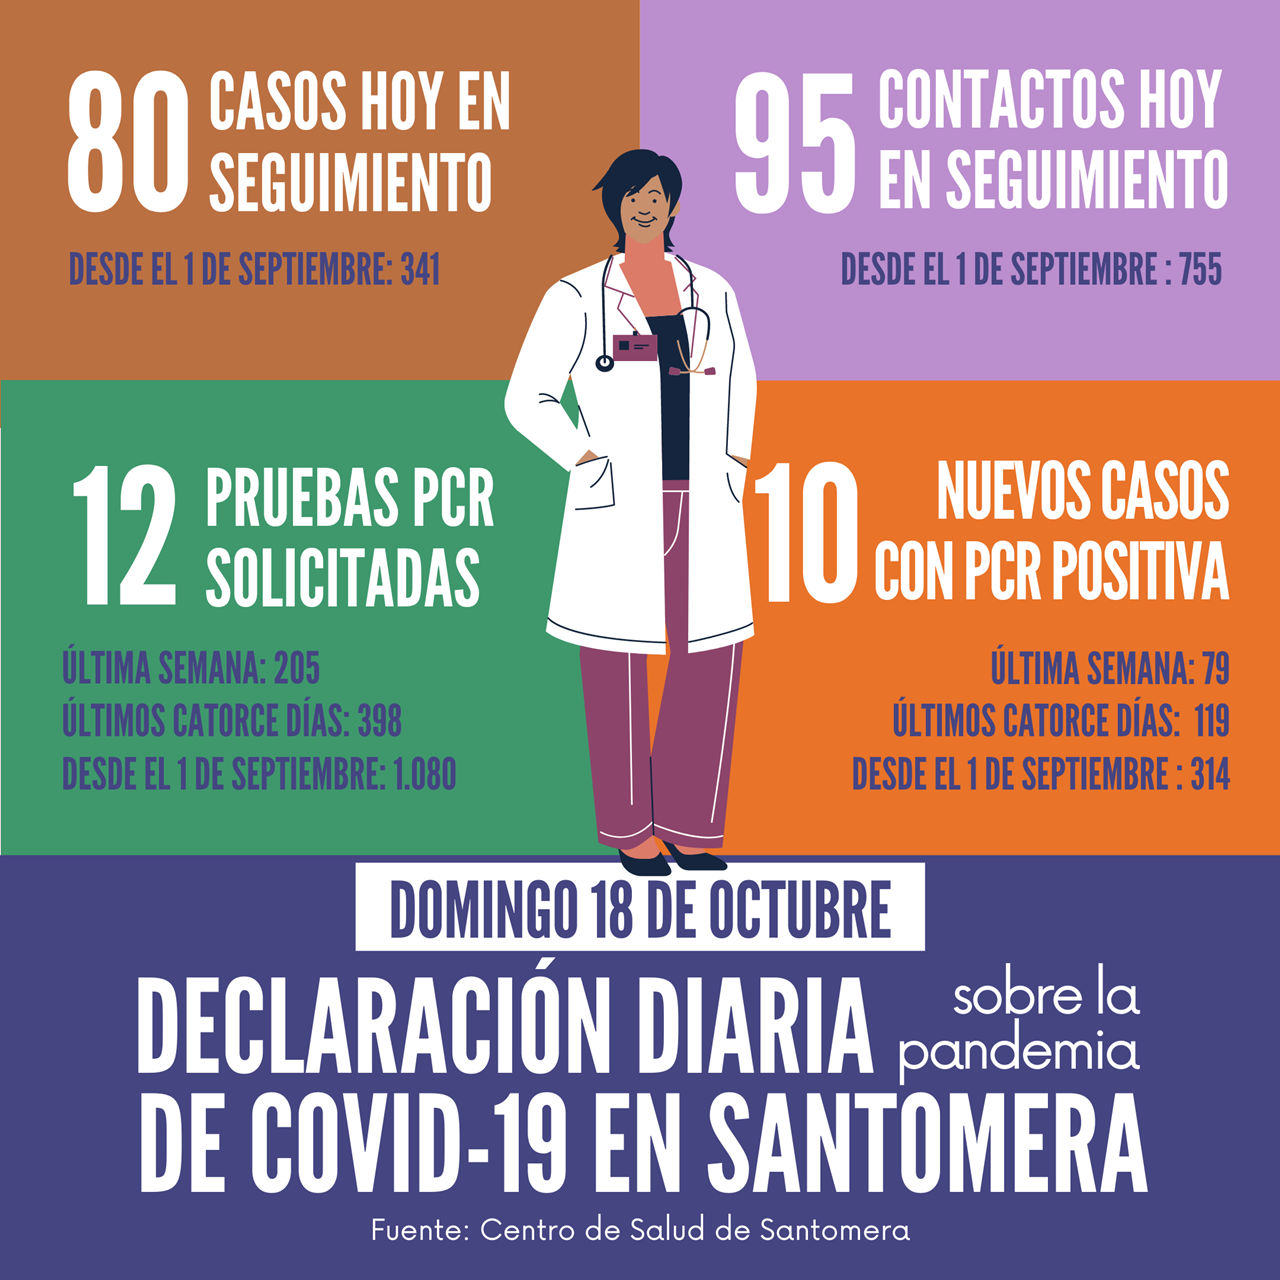 20201018_Datos COVID-19 Santomera